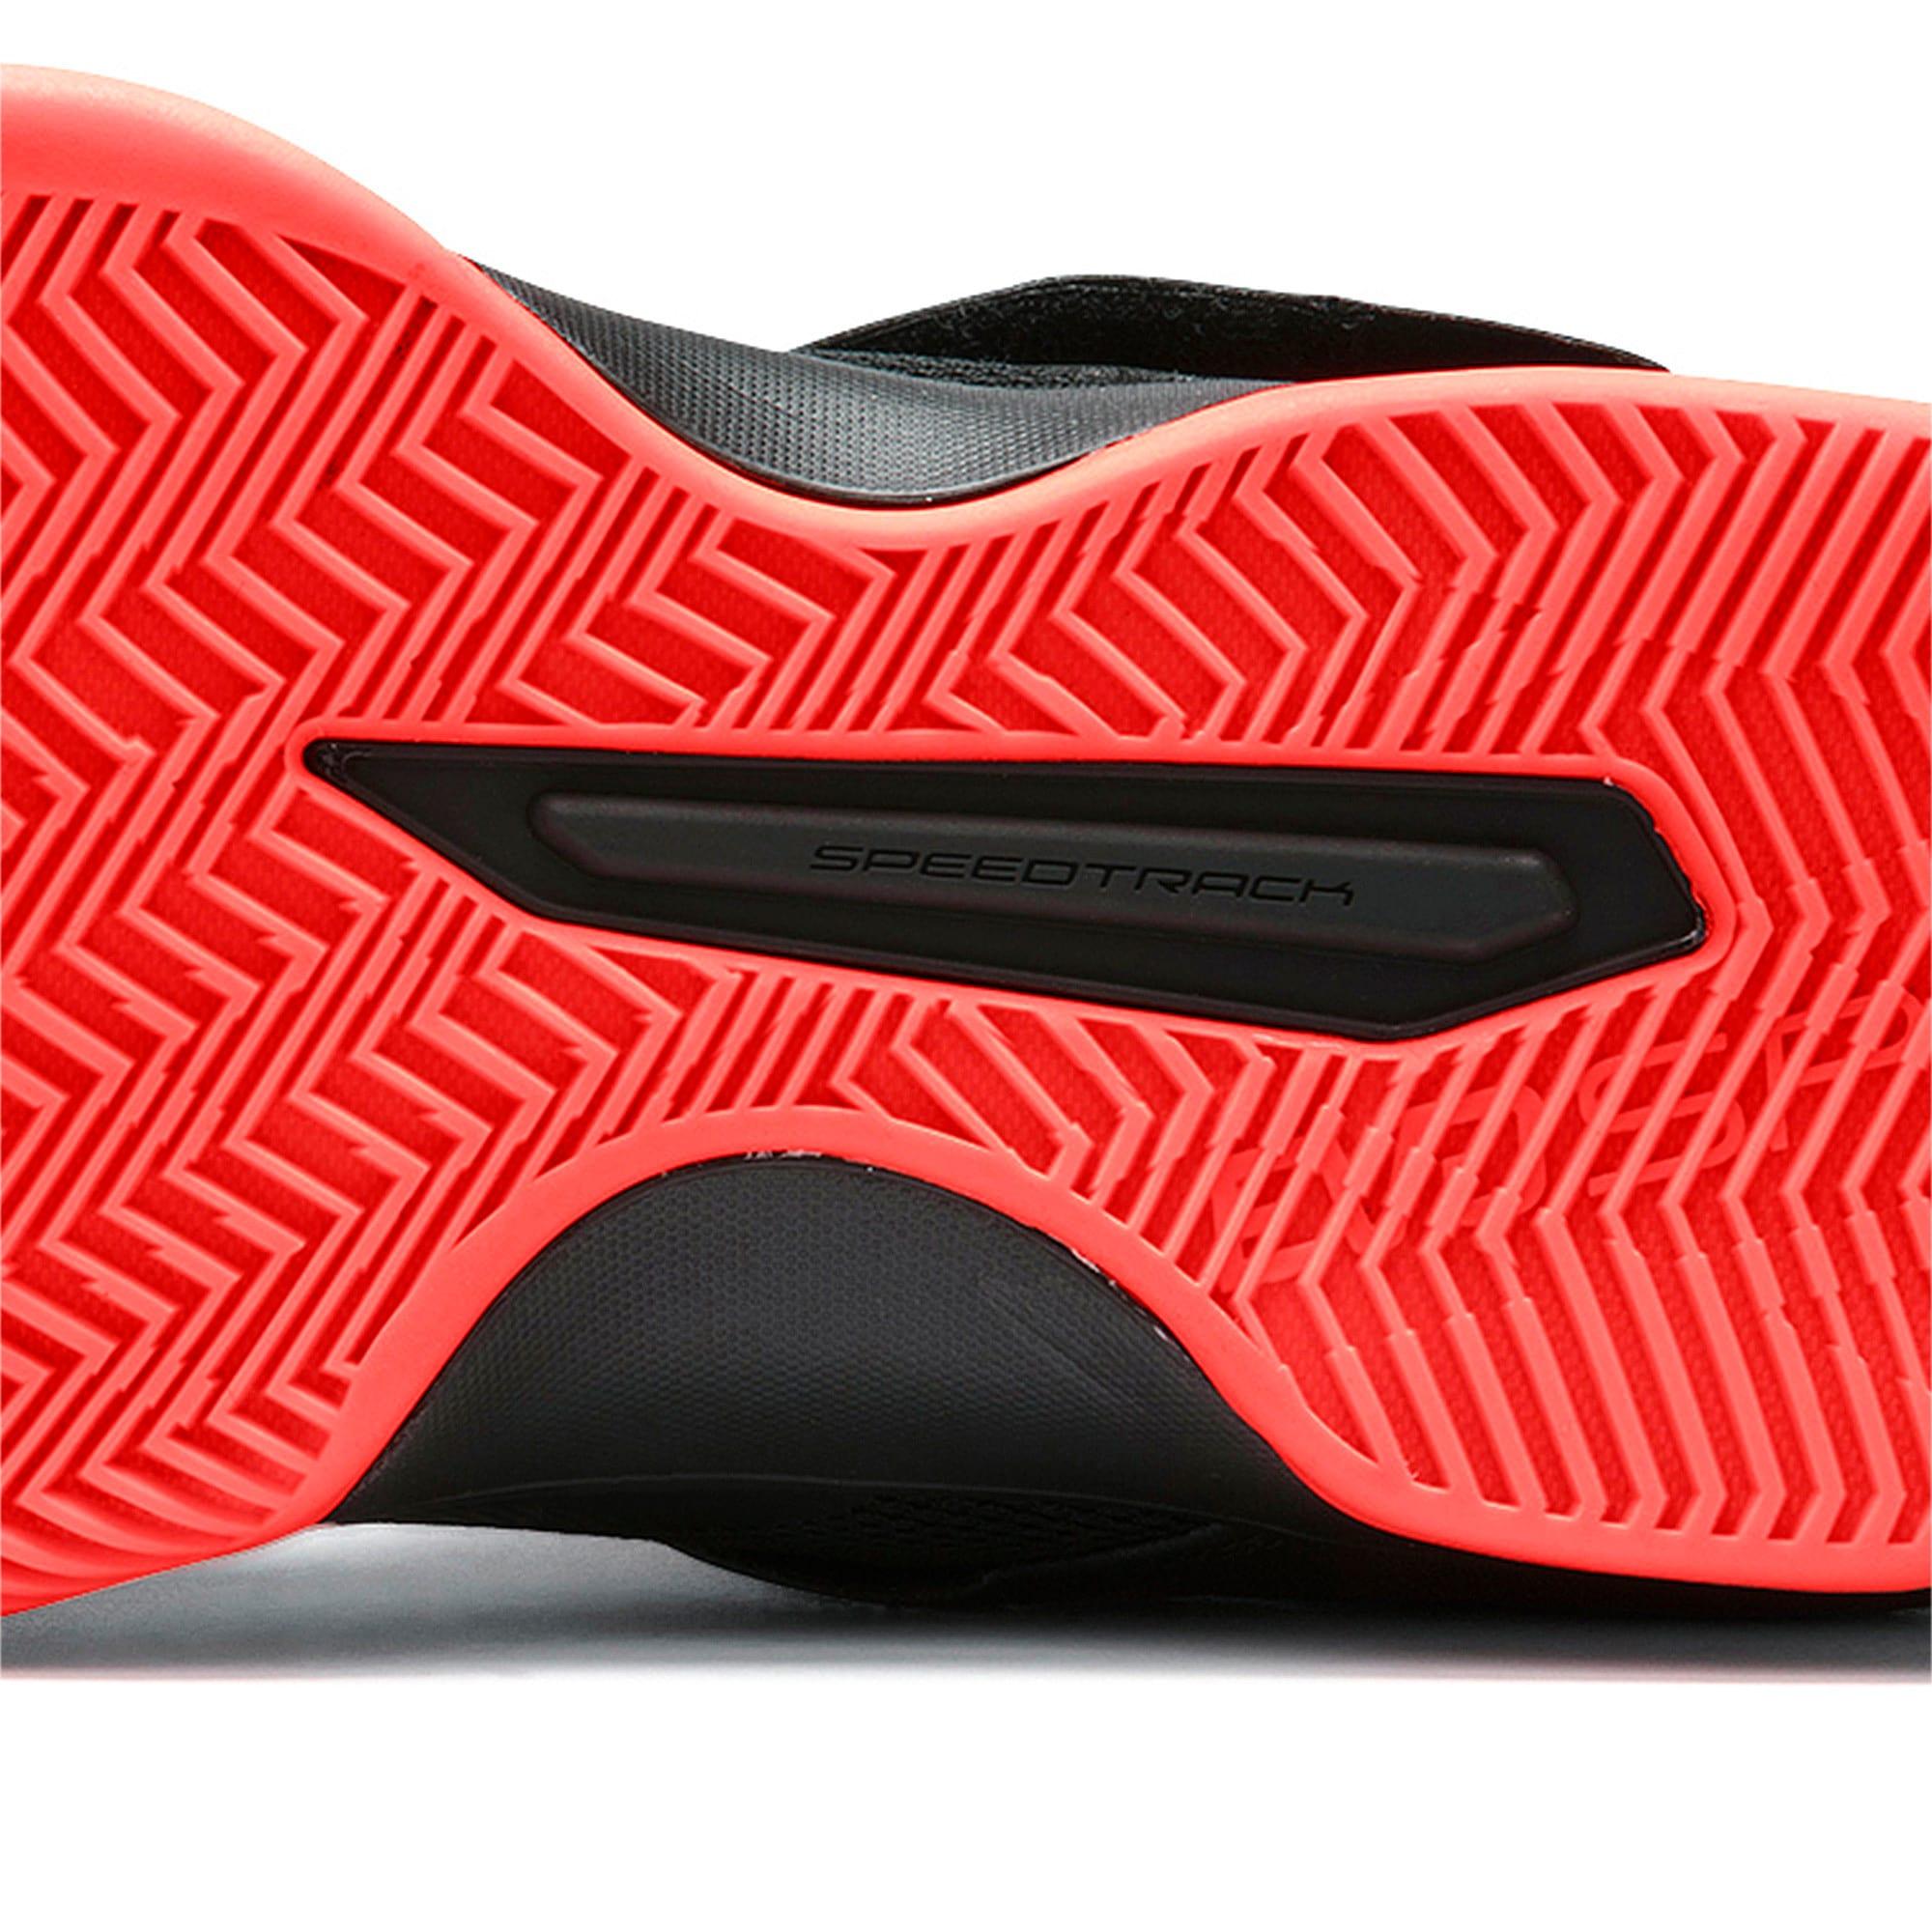 Thumbnail 8 of Chaussures Handball Rise XT3, Puma Black-Silver-Nrgy Red, medium